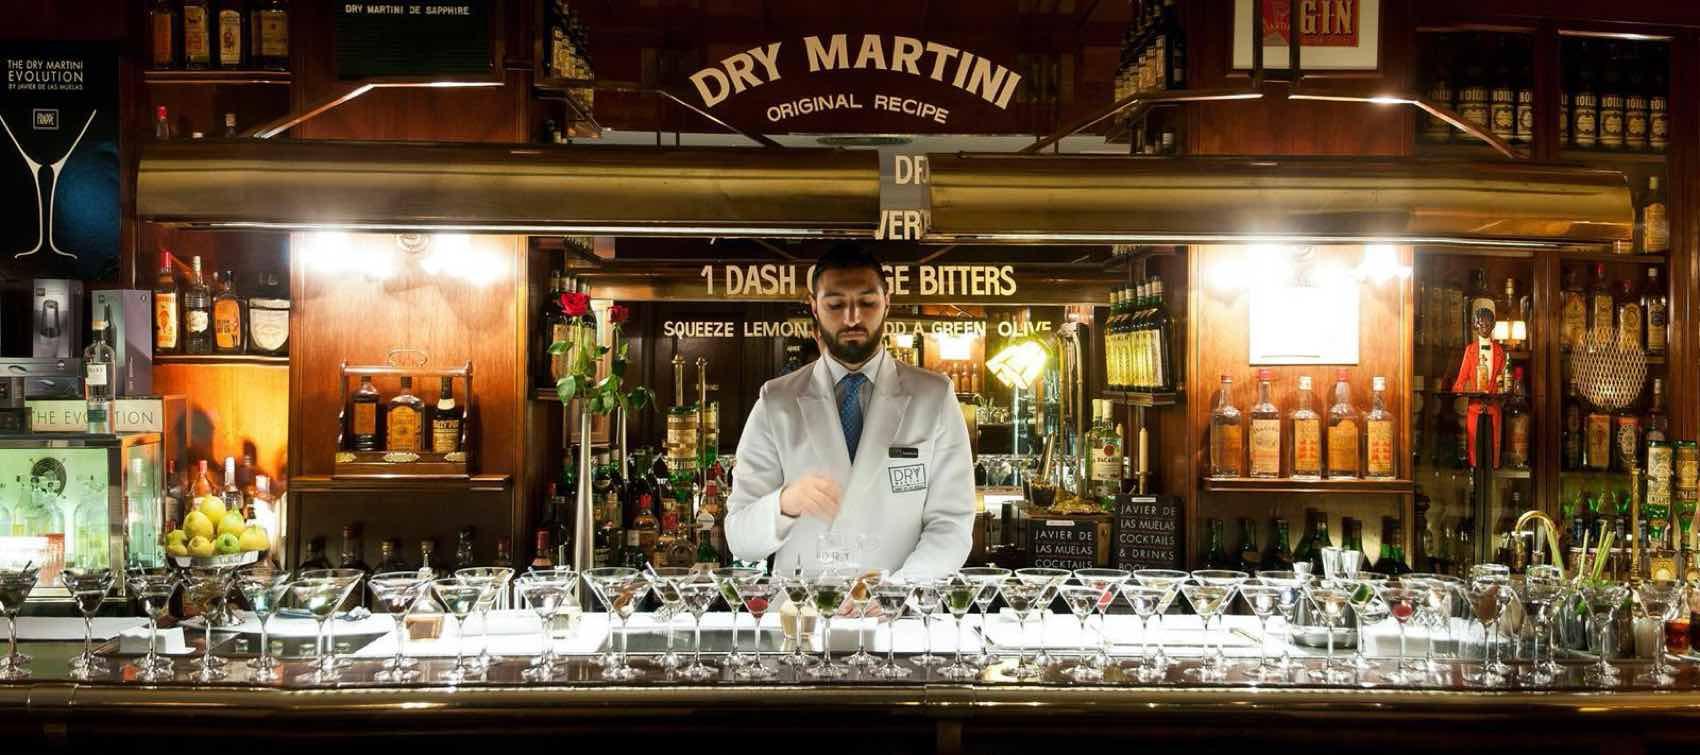 Hos Javier de Las Muelas cockail bar i Barcelona mikses ekte Dry Martini